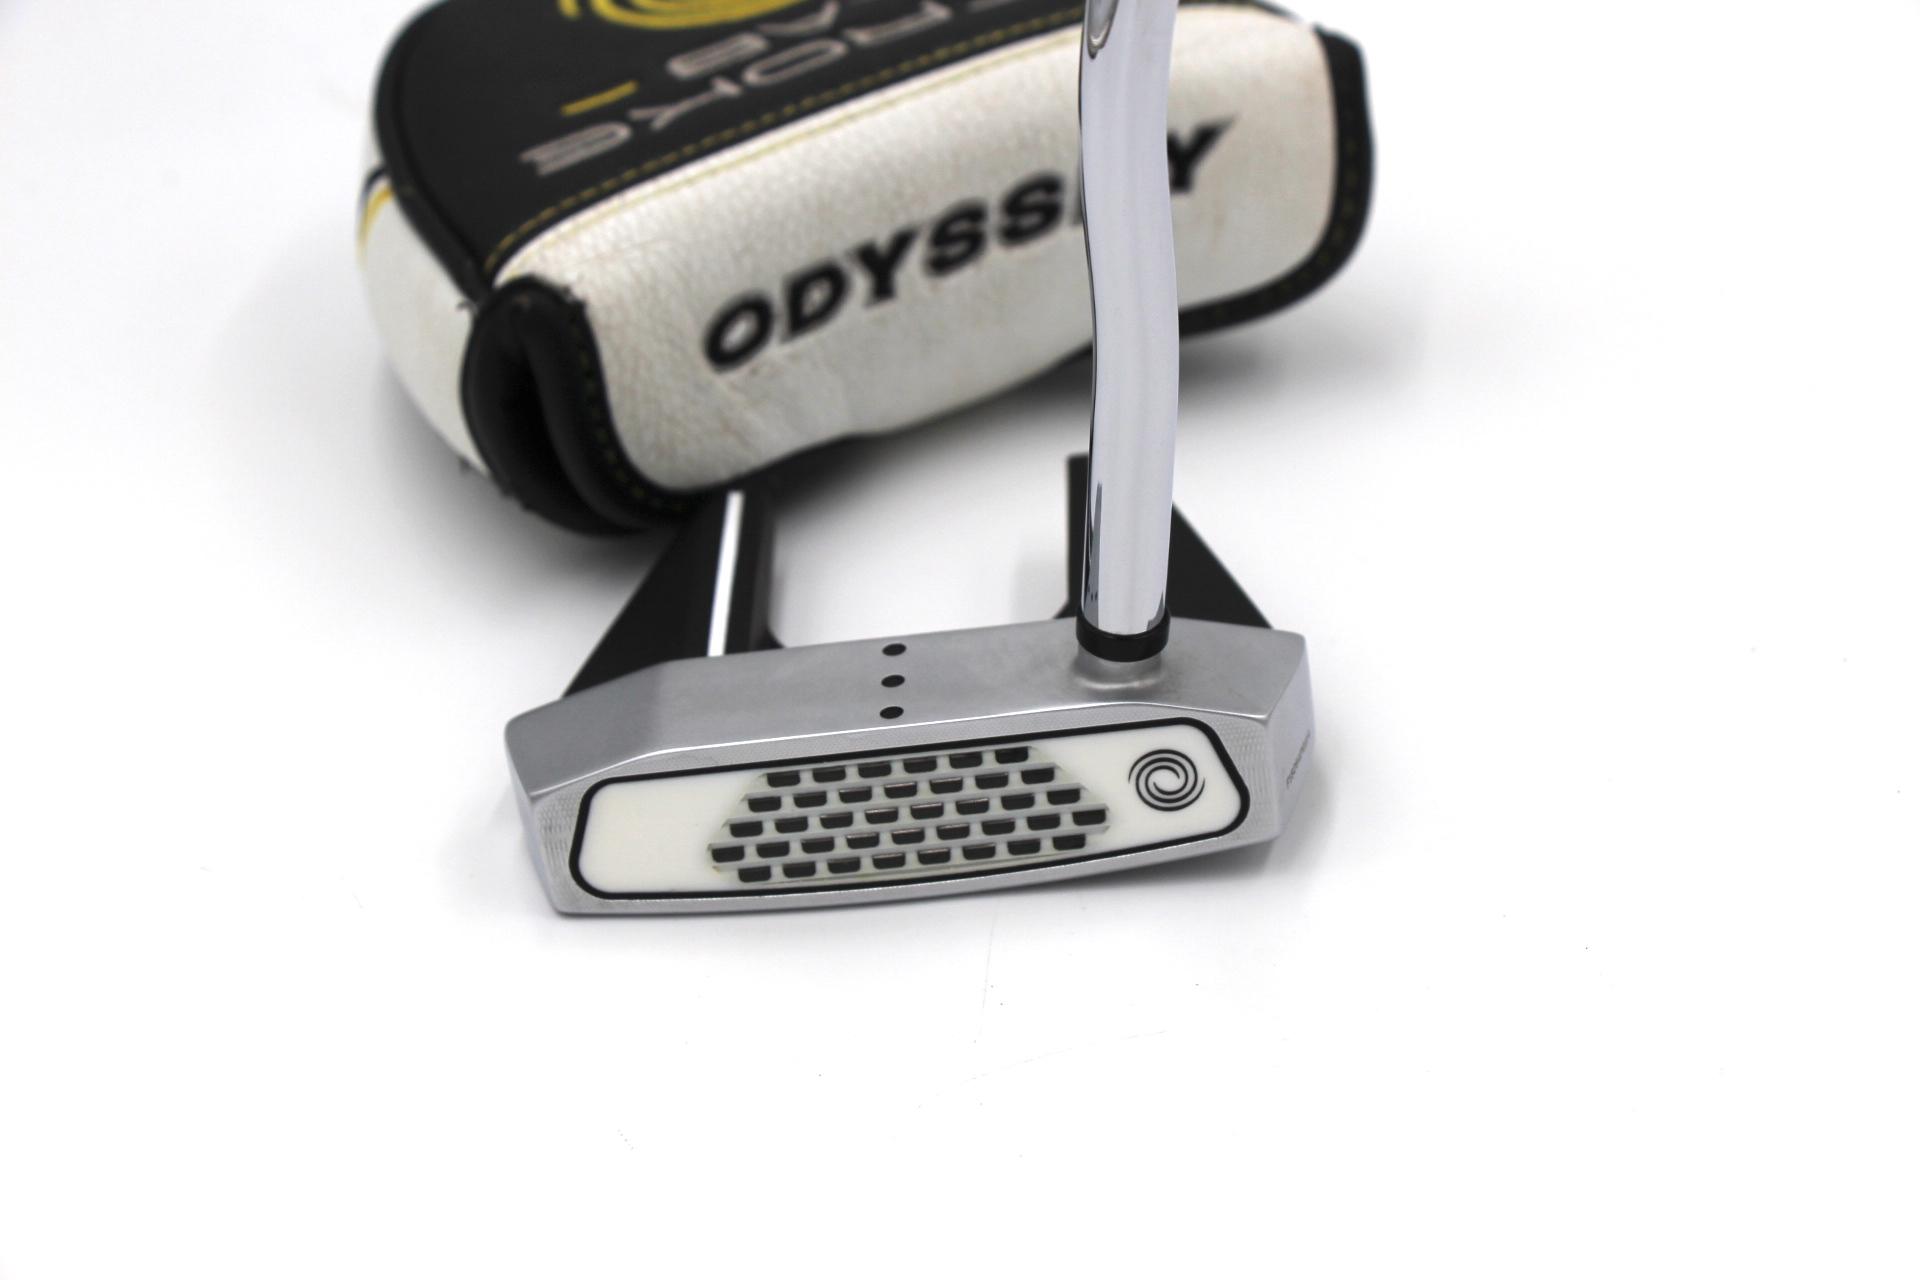 Odyssey Stroke Lab Seven Putter